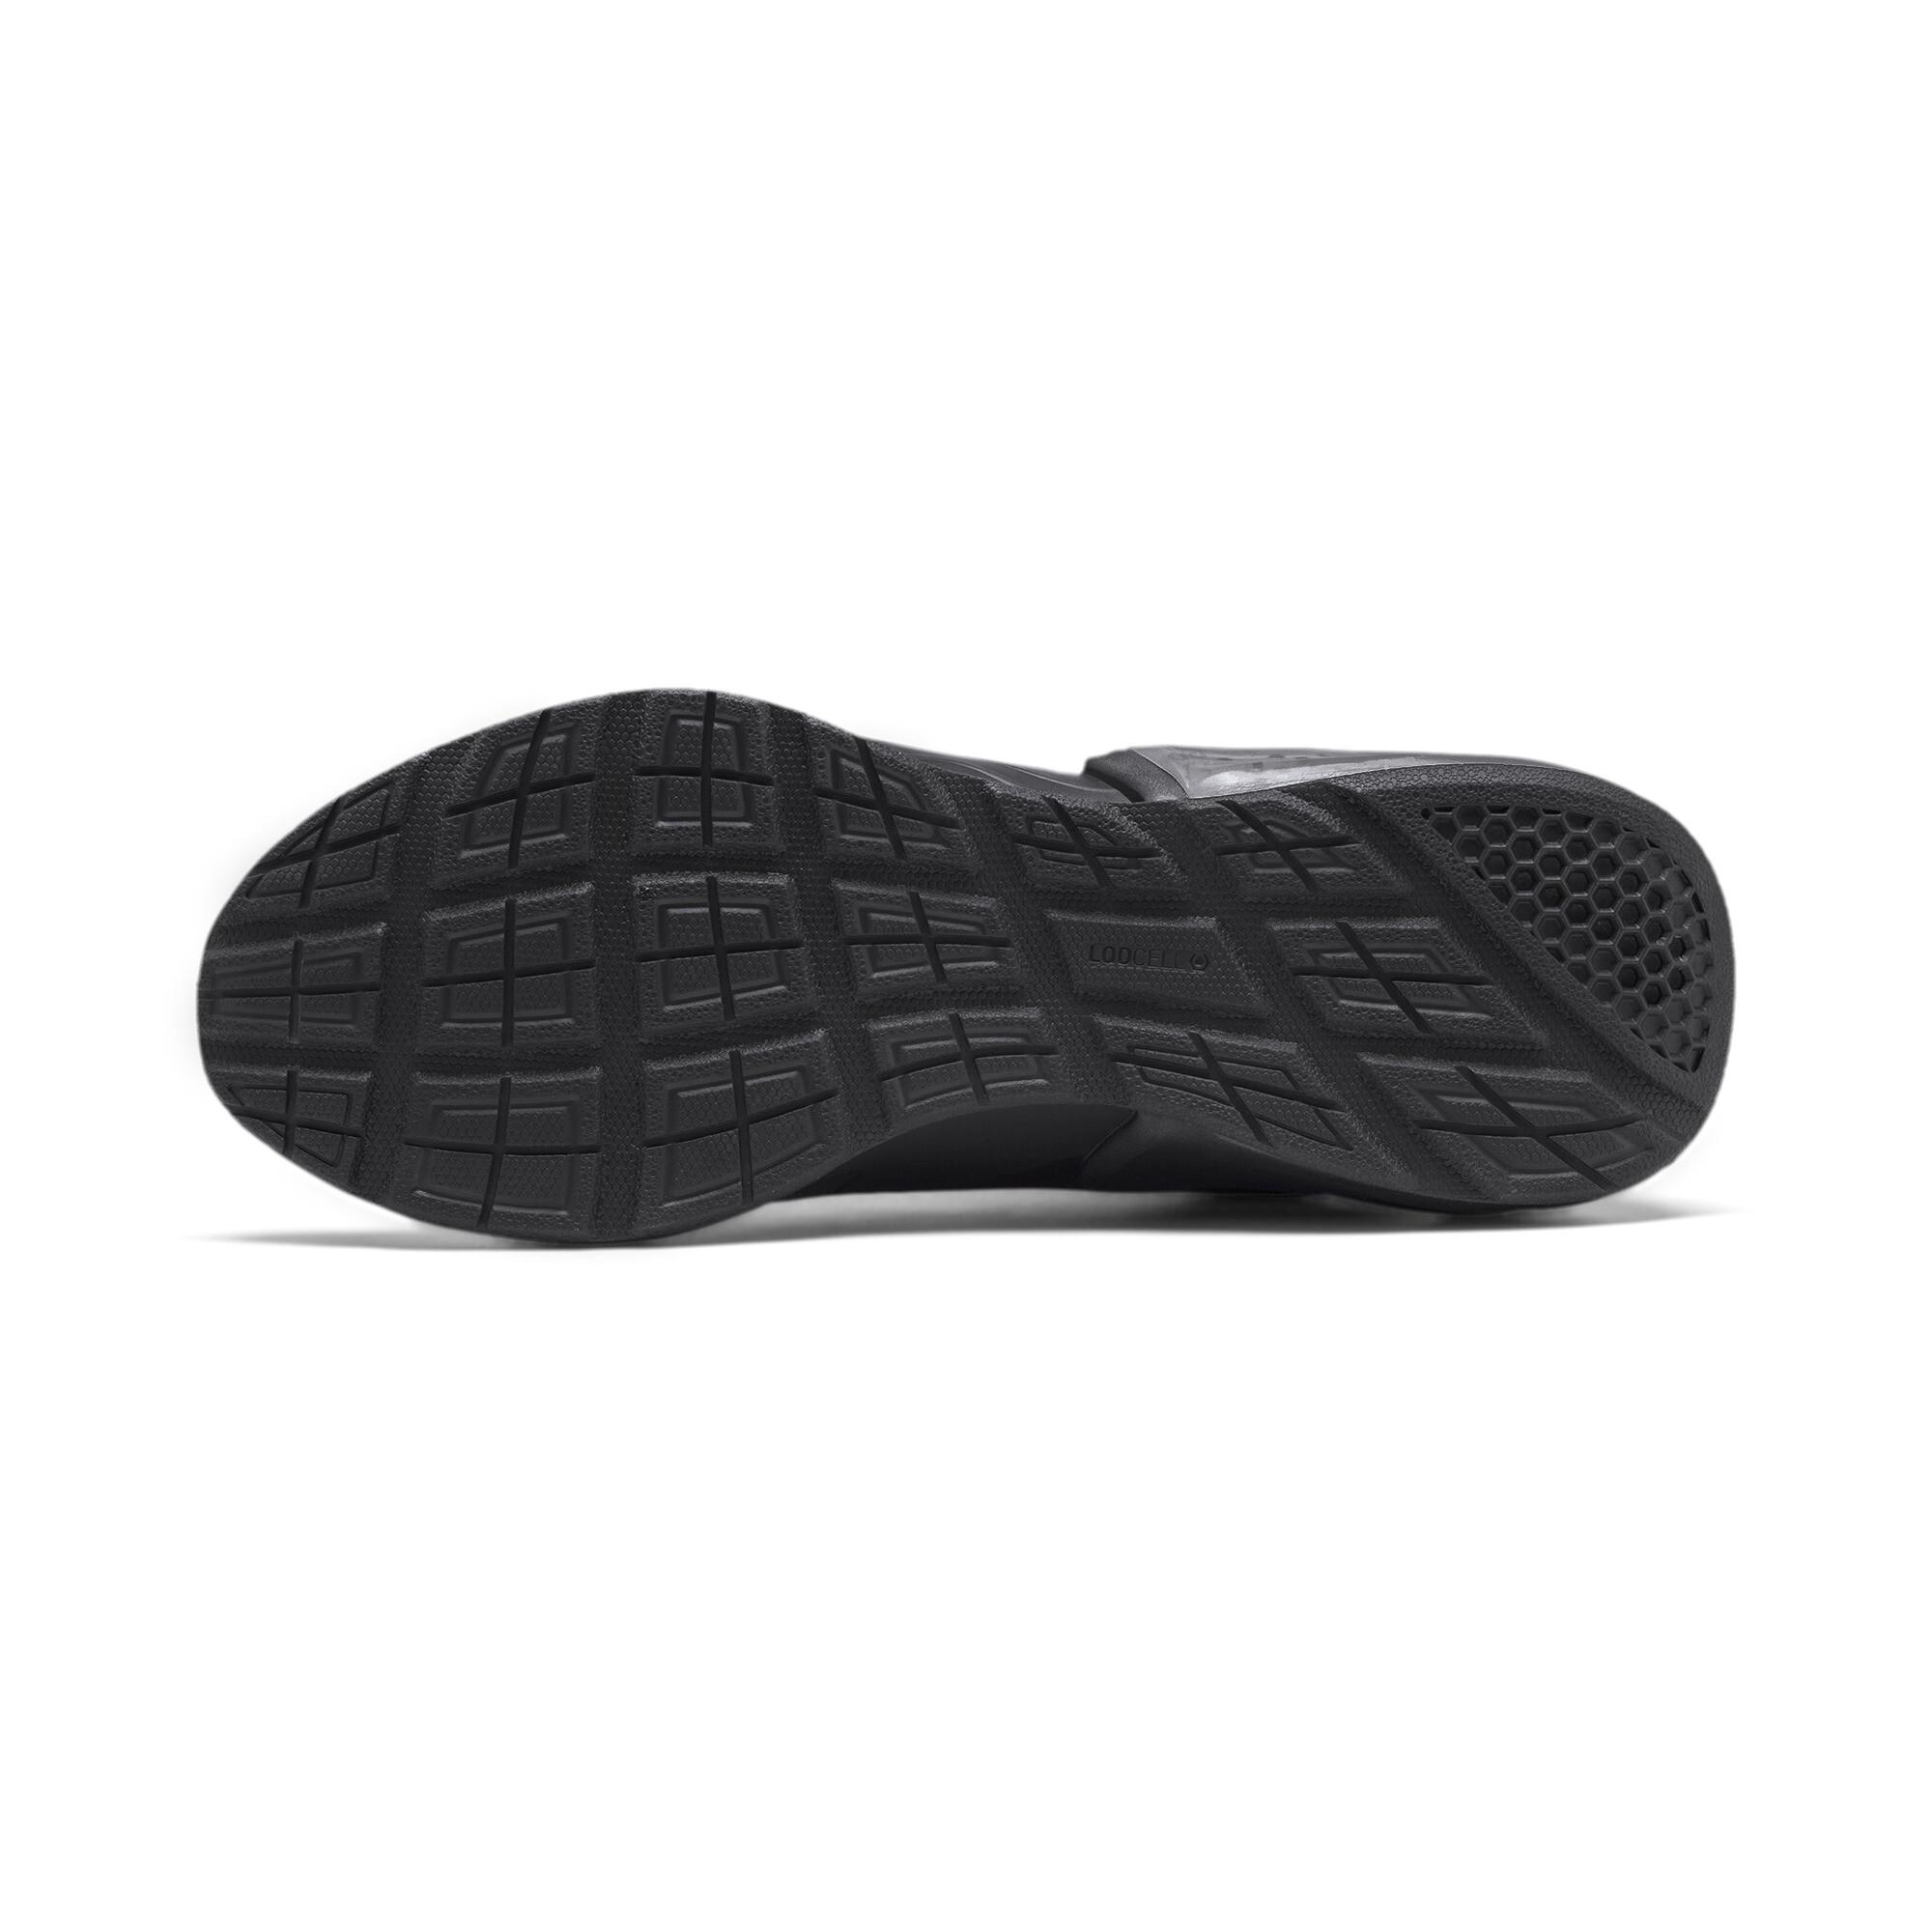 PUMA-Men-039-s-LQDCELL-Challenge-Perf-Training-Shoes thumbnail 13